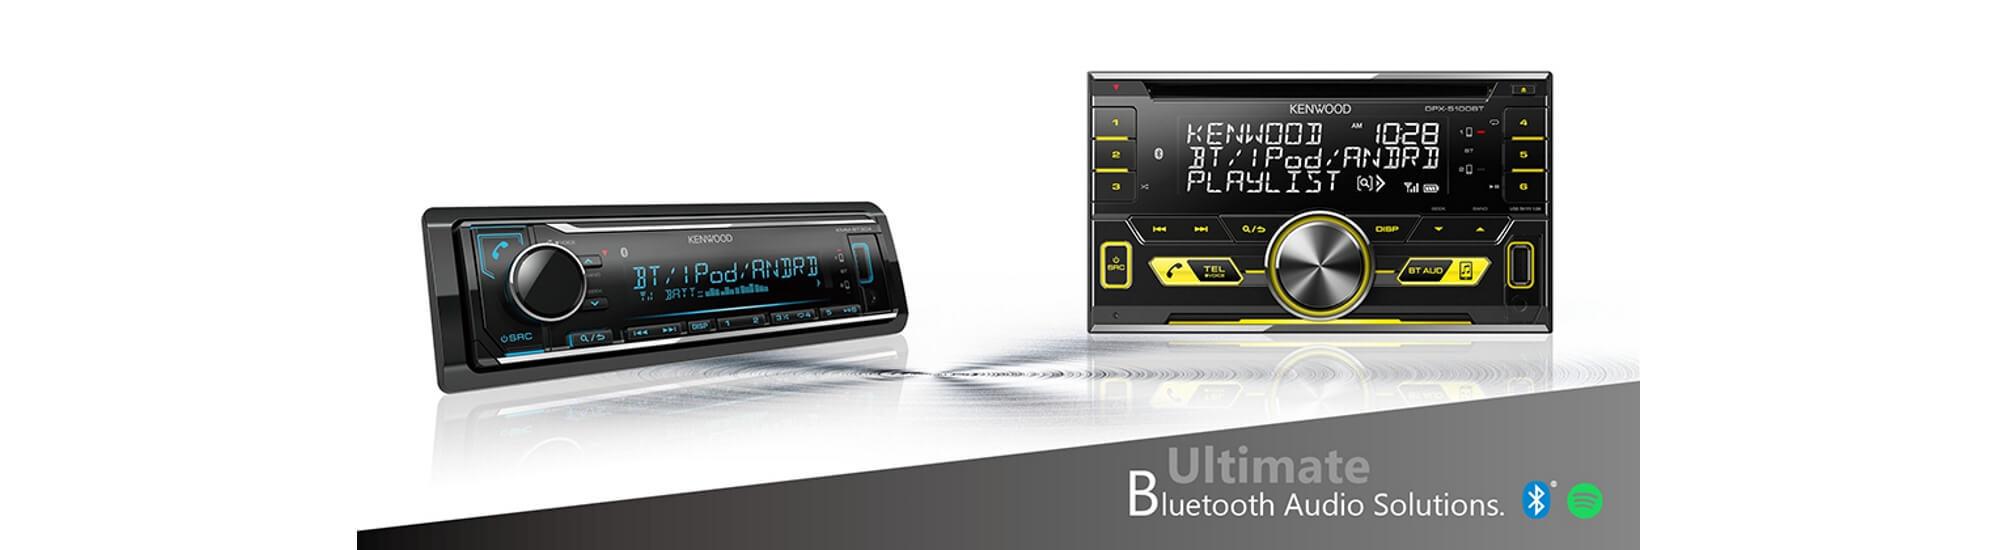 New car stereo installation Wellington stereos Lower Hutt Porirua